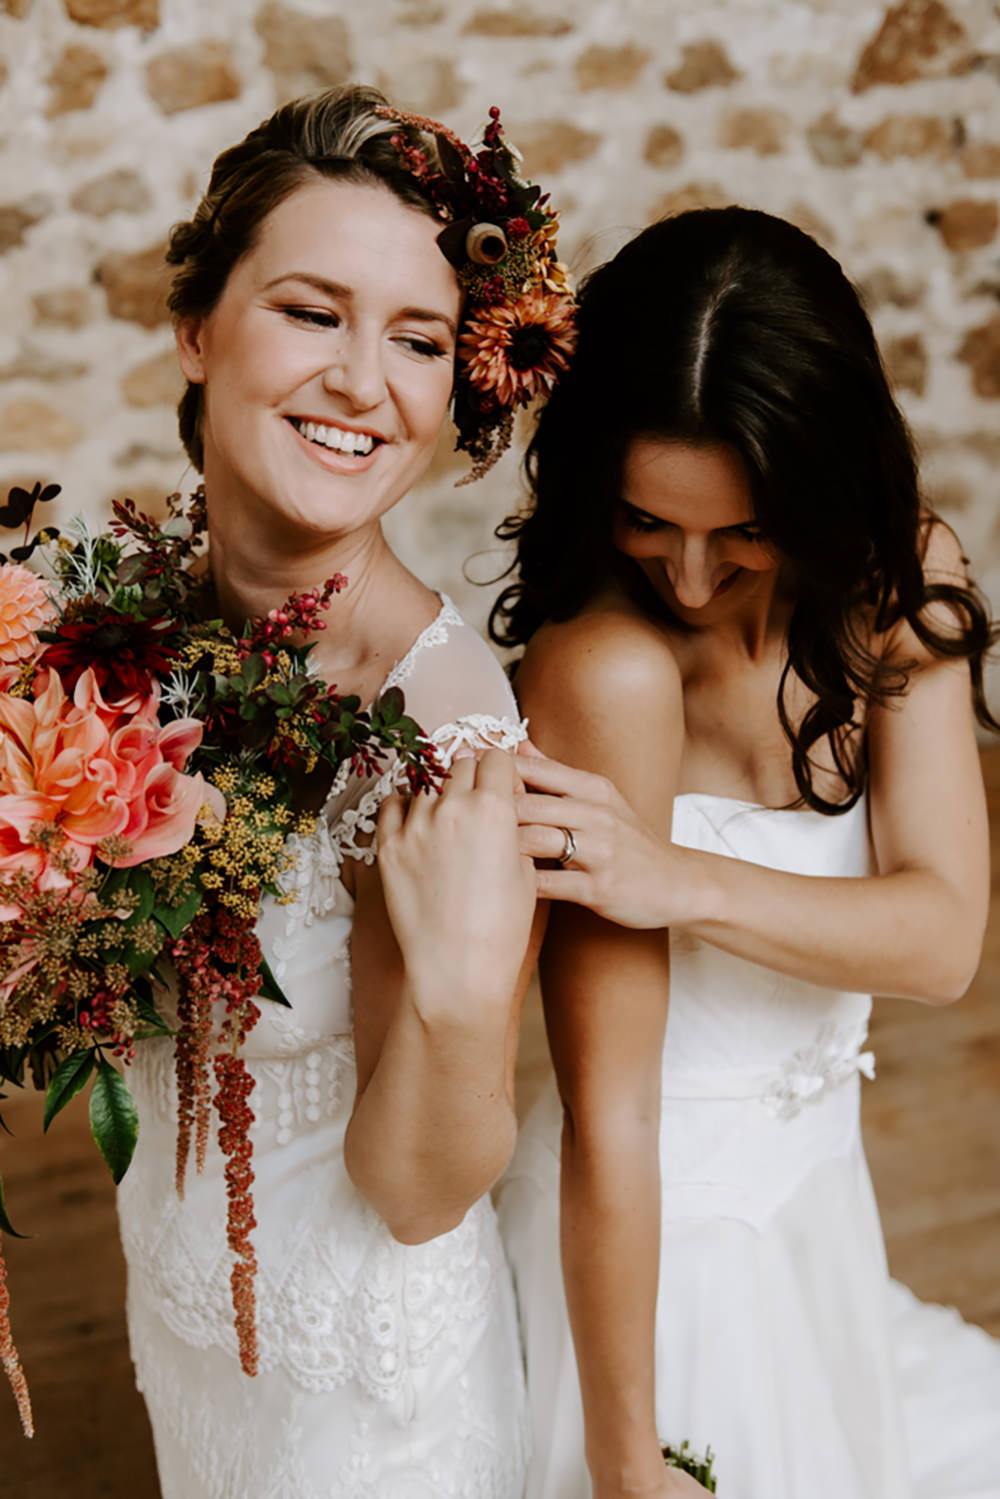 Bride Bridal Make Up Headdress Flower Crown Flowers Hairband Ethical Wedding Ideas Sadie Osborne Photography